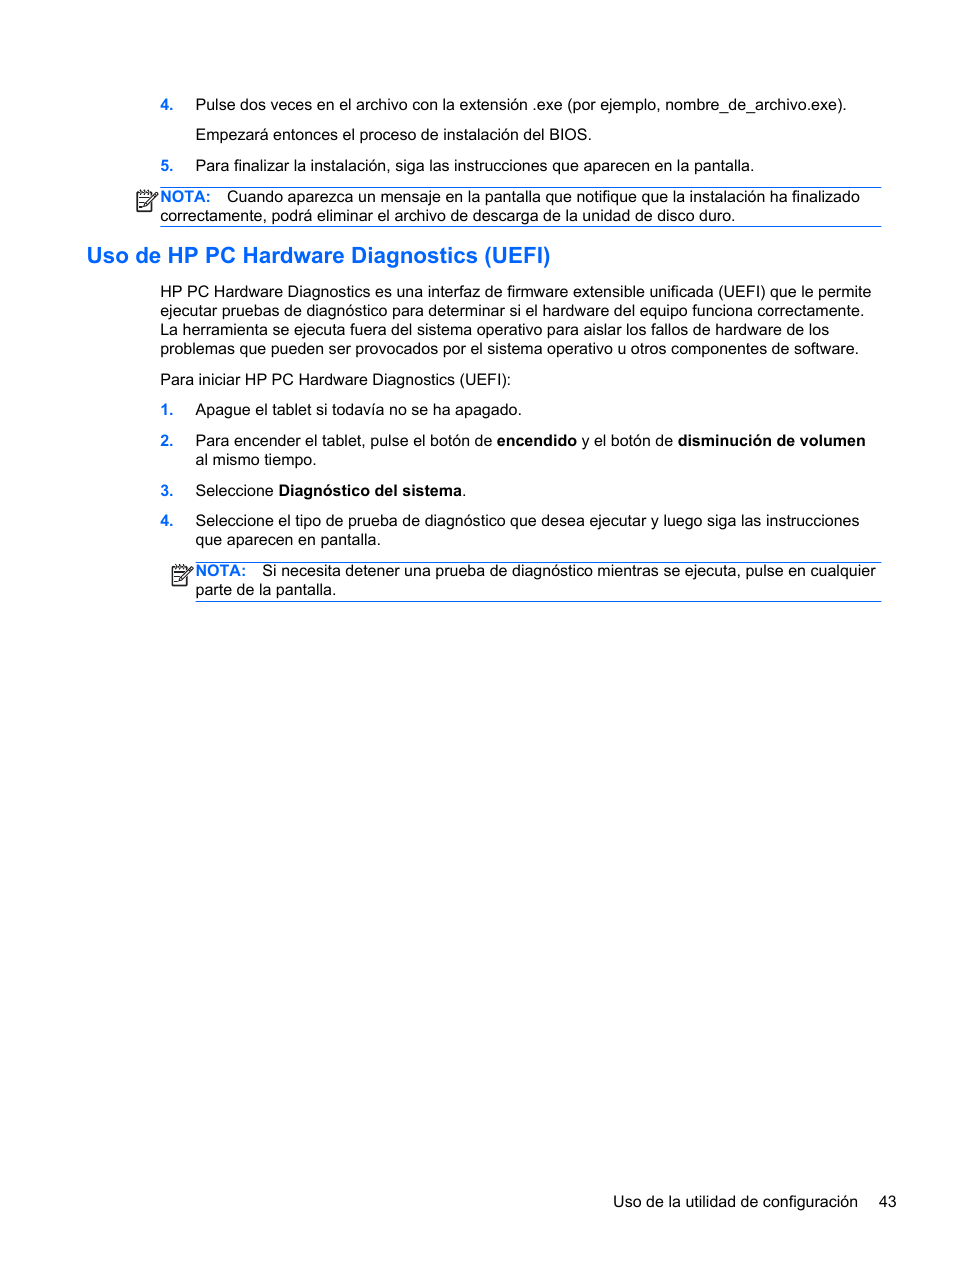 Uso de hp pc hardware diagnostics (uefi) | HP Tablet HP ElitePad